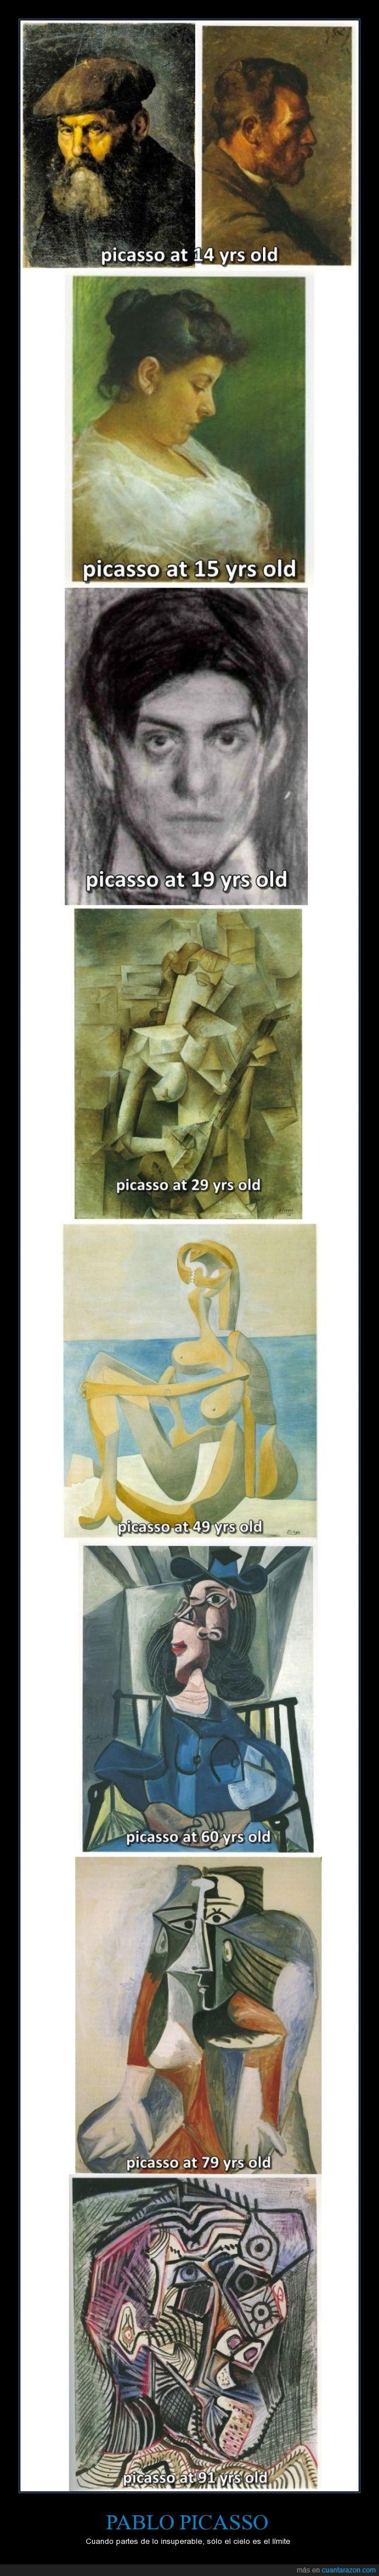 arte,cuadro,cubismo,deconstruccion,evolucion,Pablo Picasso,pintura,realismo,talento